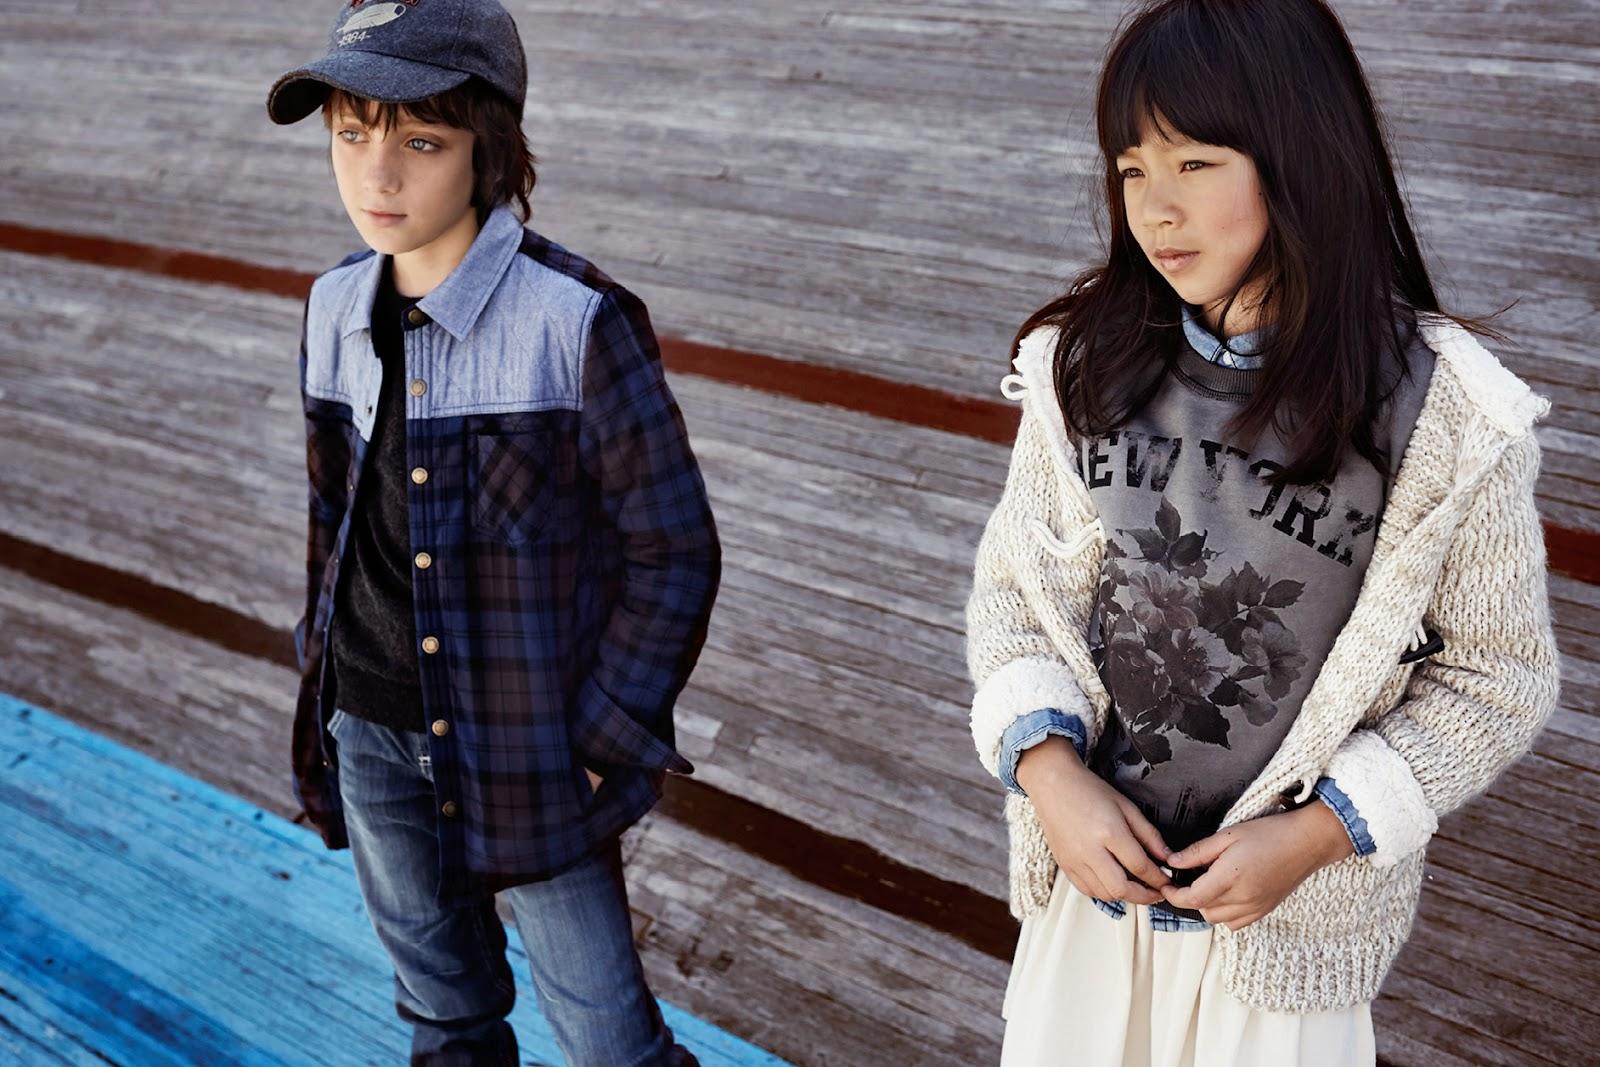 Mango Kids 'The Cycle Track' Lookbook Fall/Winter 2014